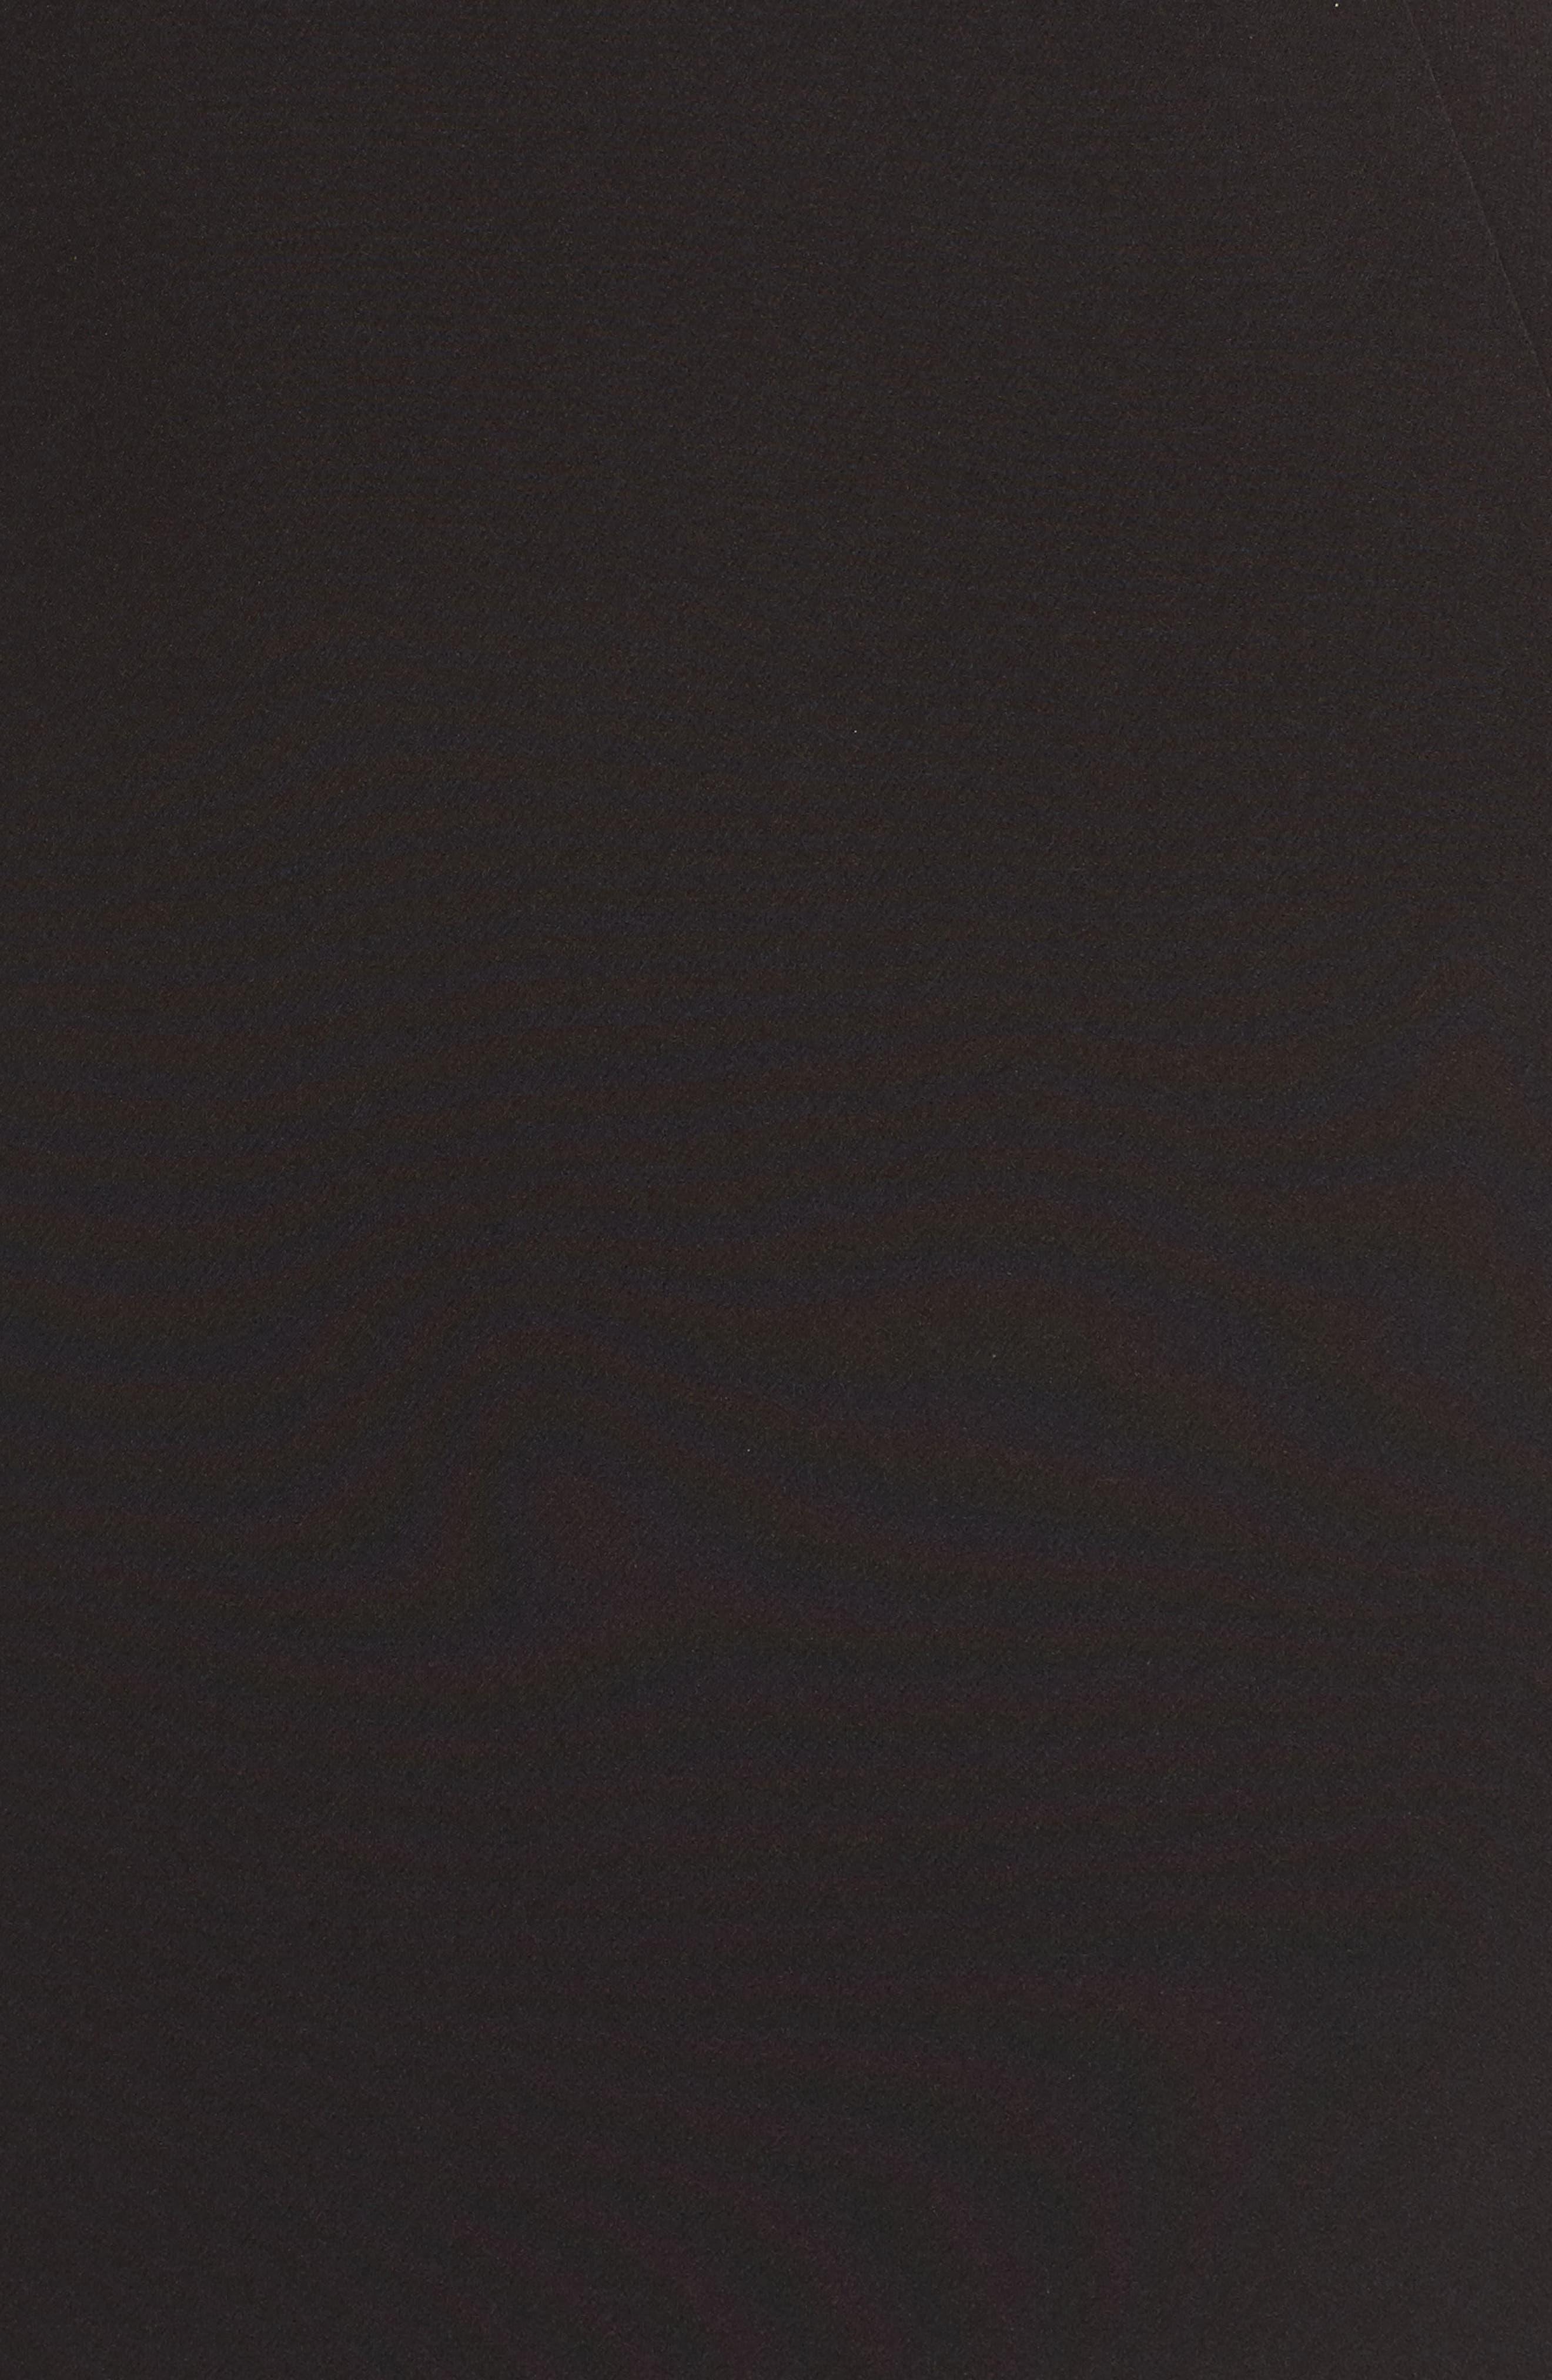 Ruffle Apron Detail Strapless Dress,                             Alternate thumbnail 6, color,                             001